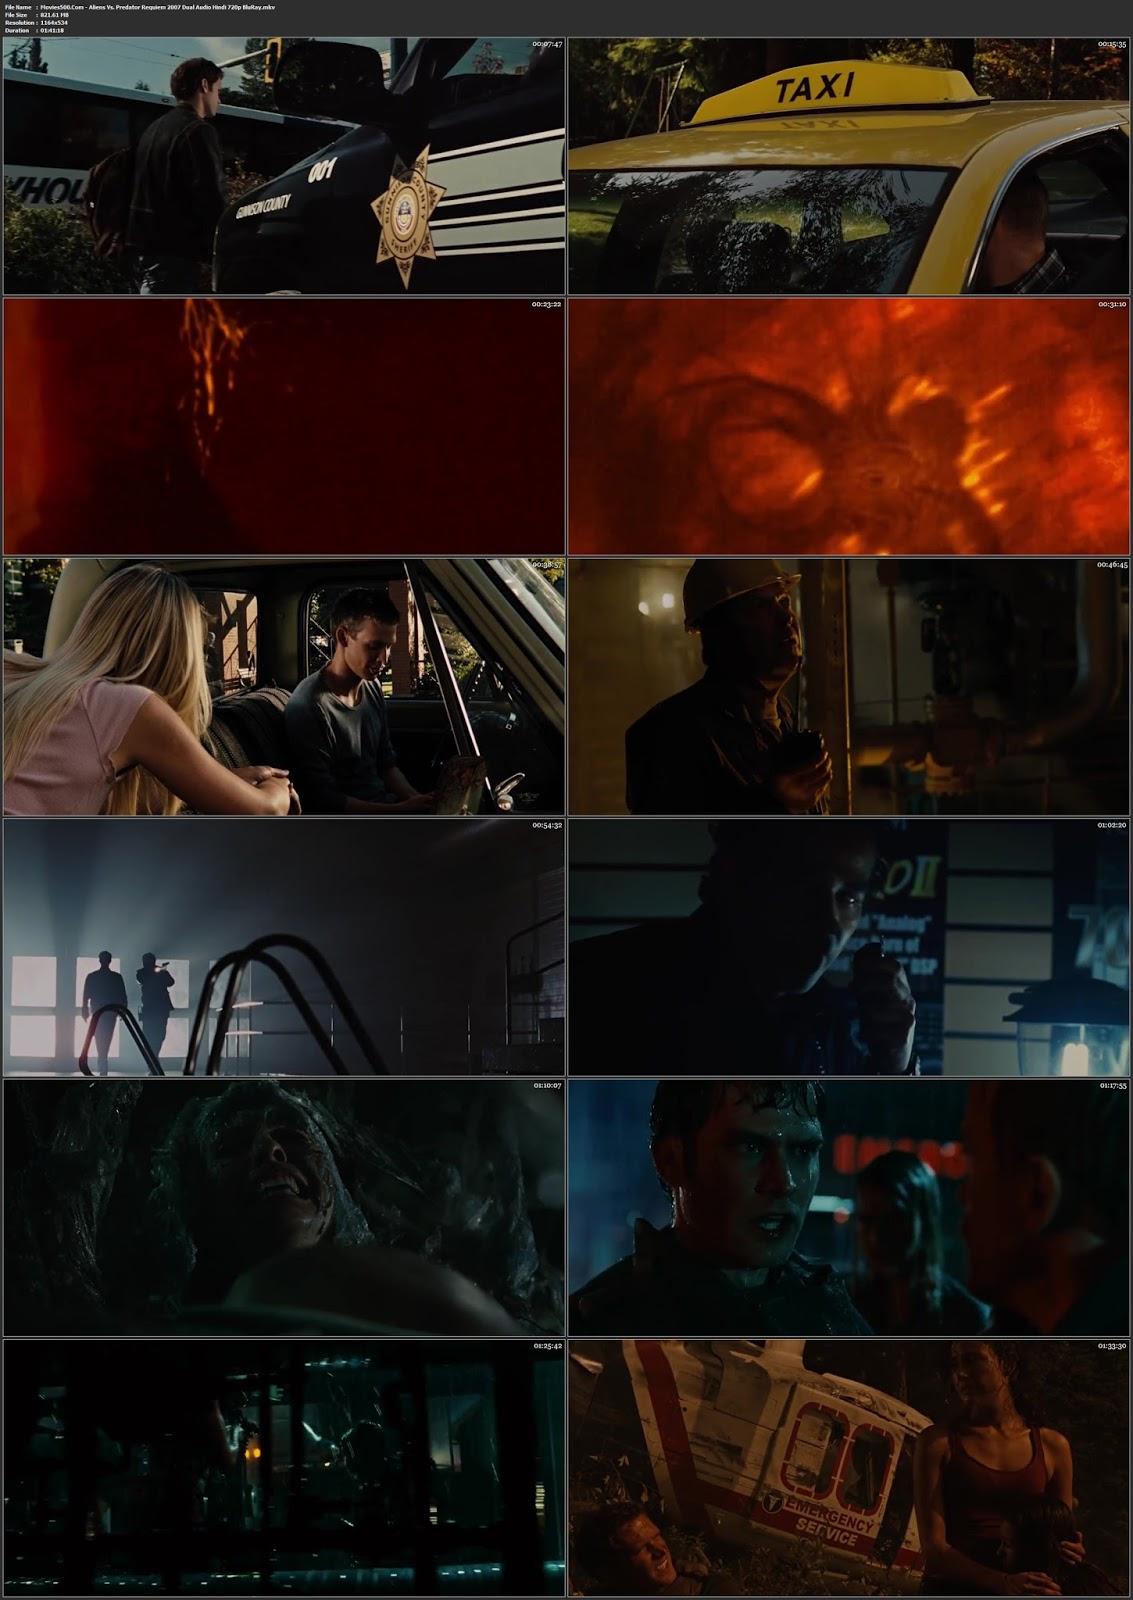 Aliens Vs. Predator Requiem 2007 Hindi English 300MB BluRay 480p at lanstream.uk